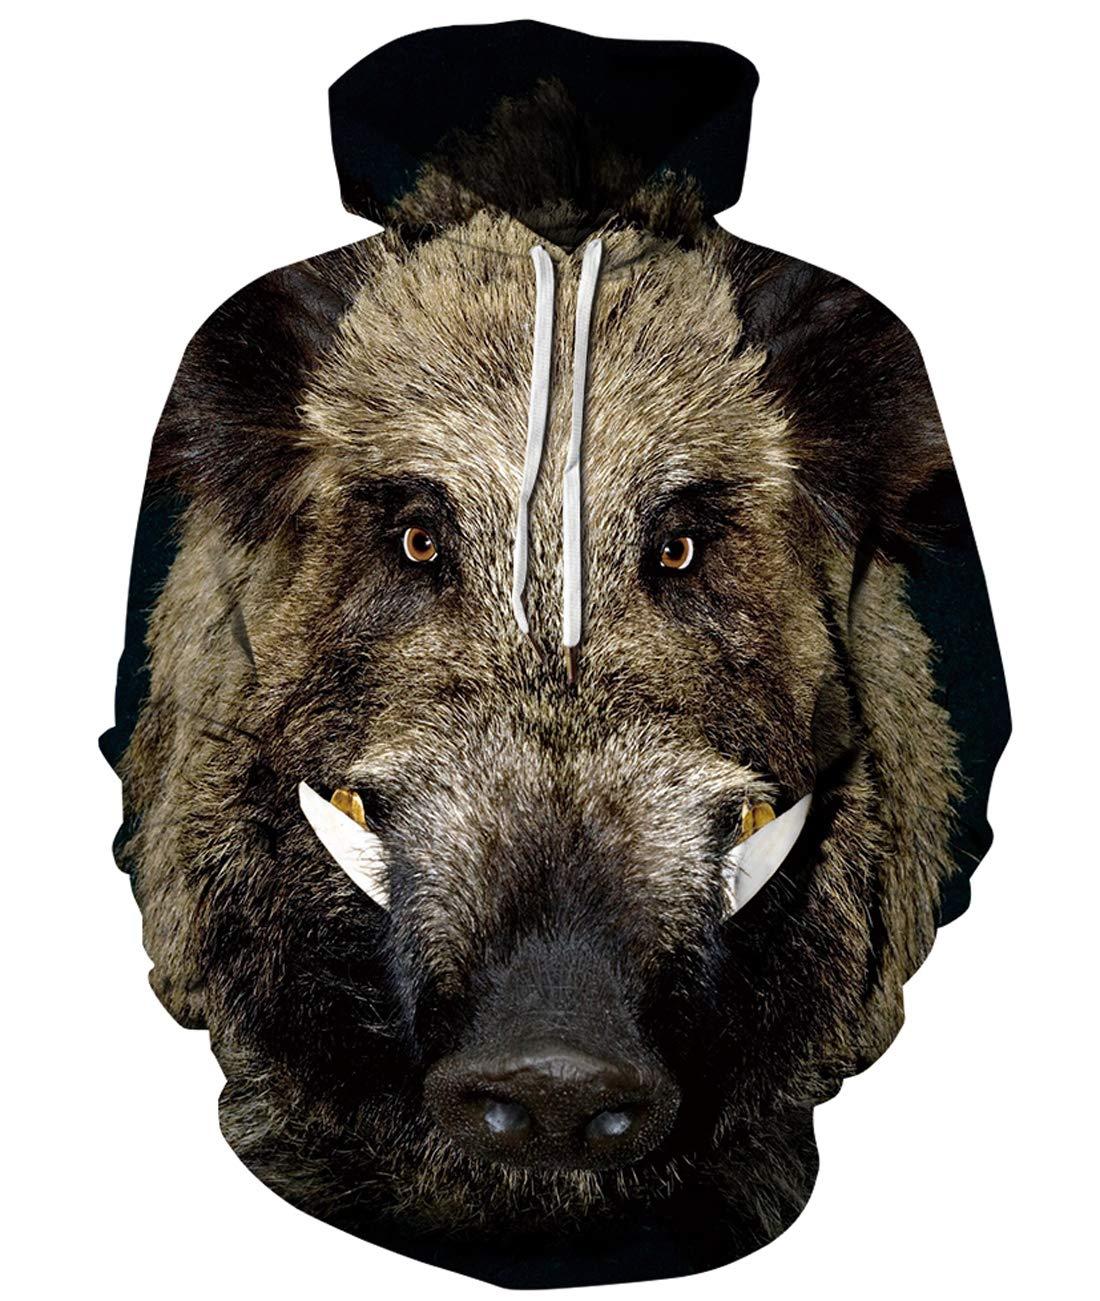 URVIP Unisex Realistic 3D Print Pullover Sweatshirt Hoodies with Big Pockets QYDM-449 S/M by URVIP